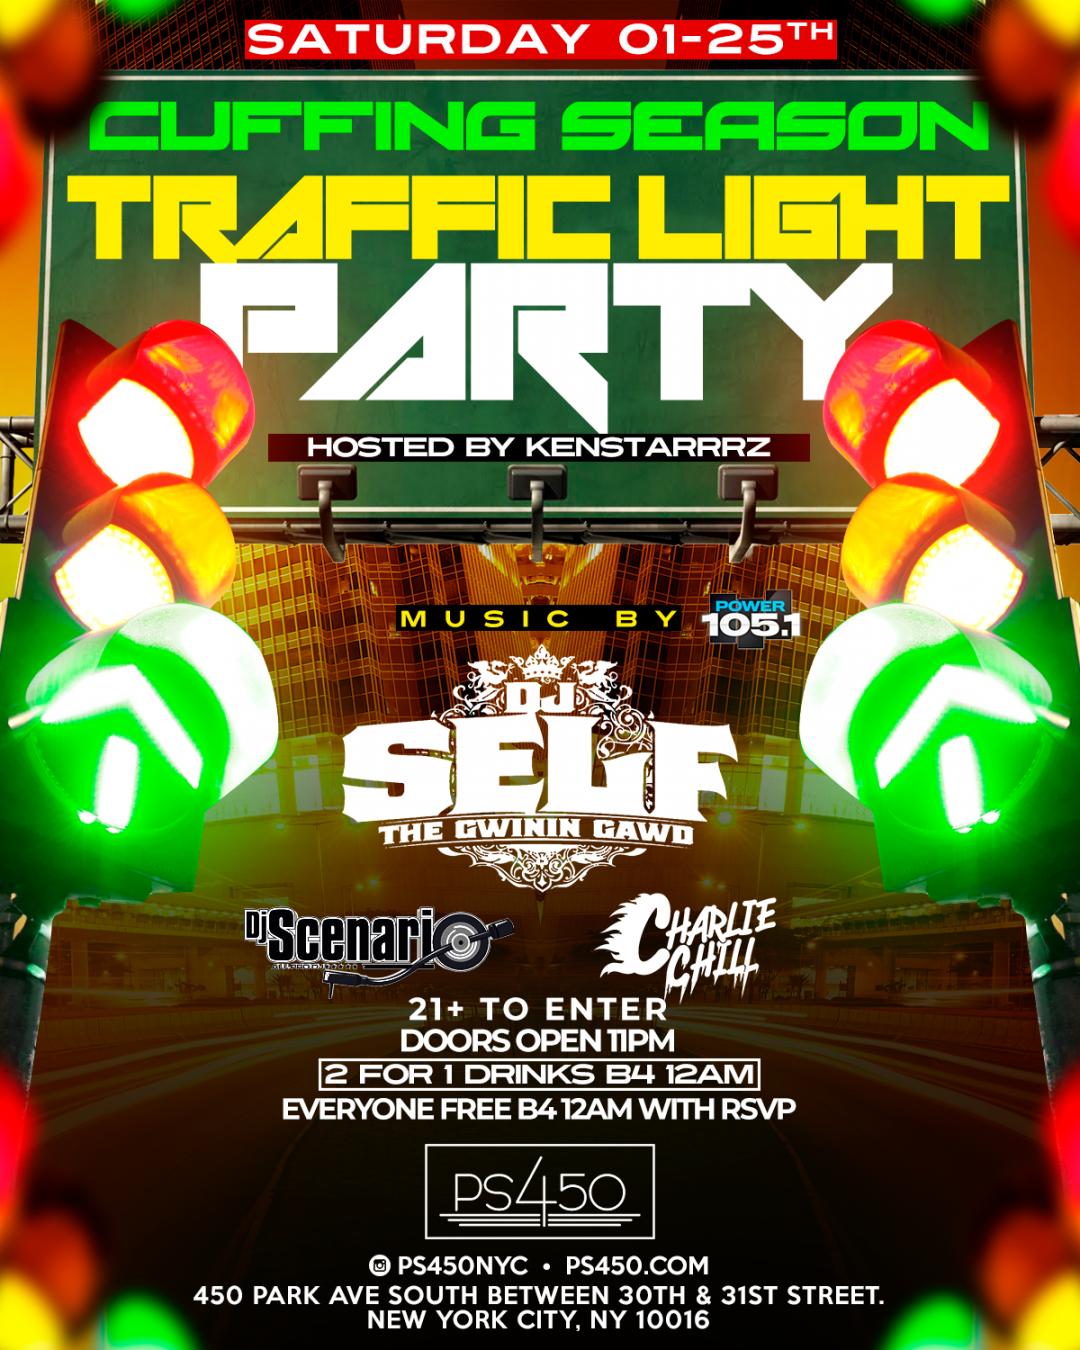 Traffic Light party DJ Self Hosted By Ken Starrrz